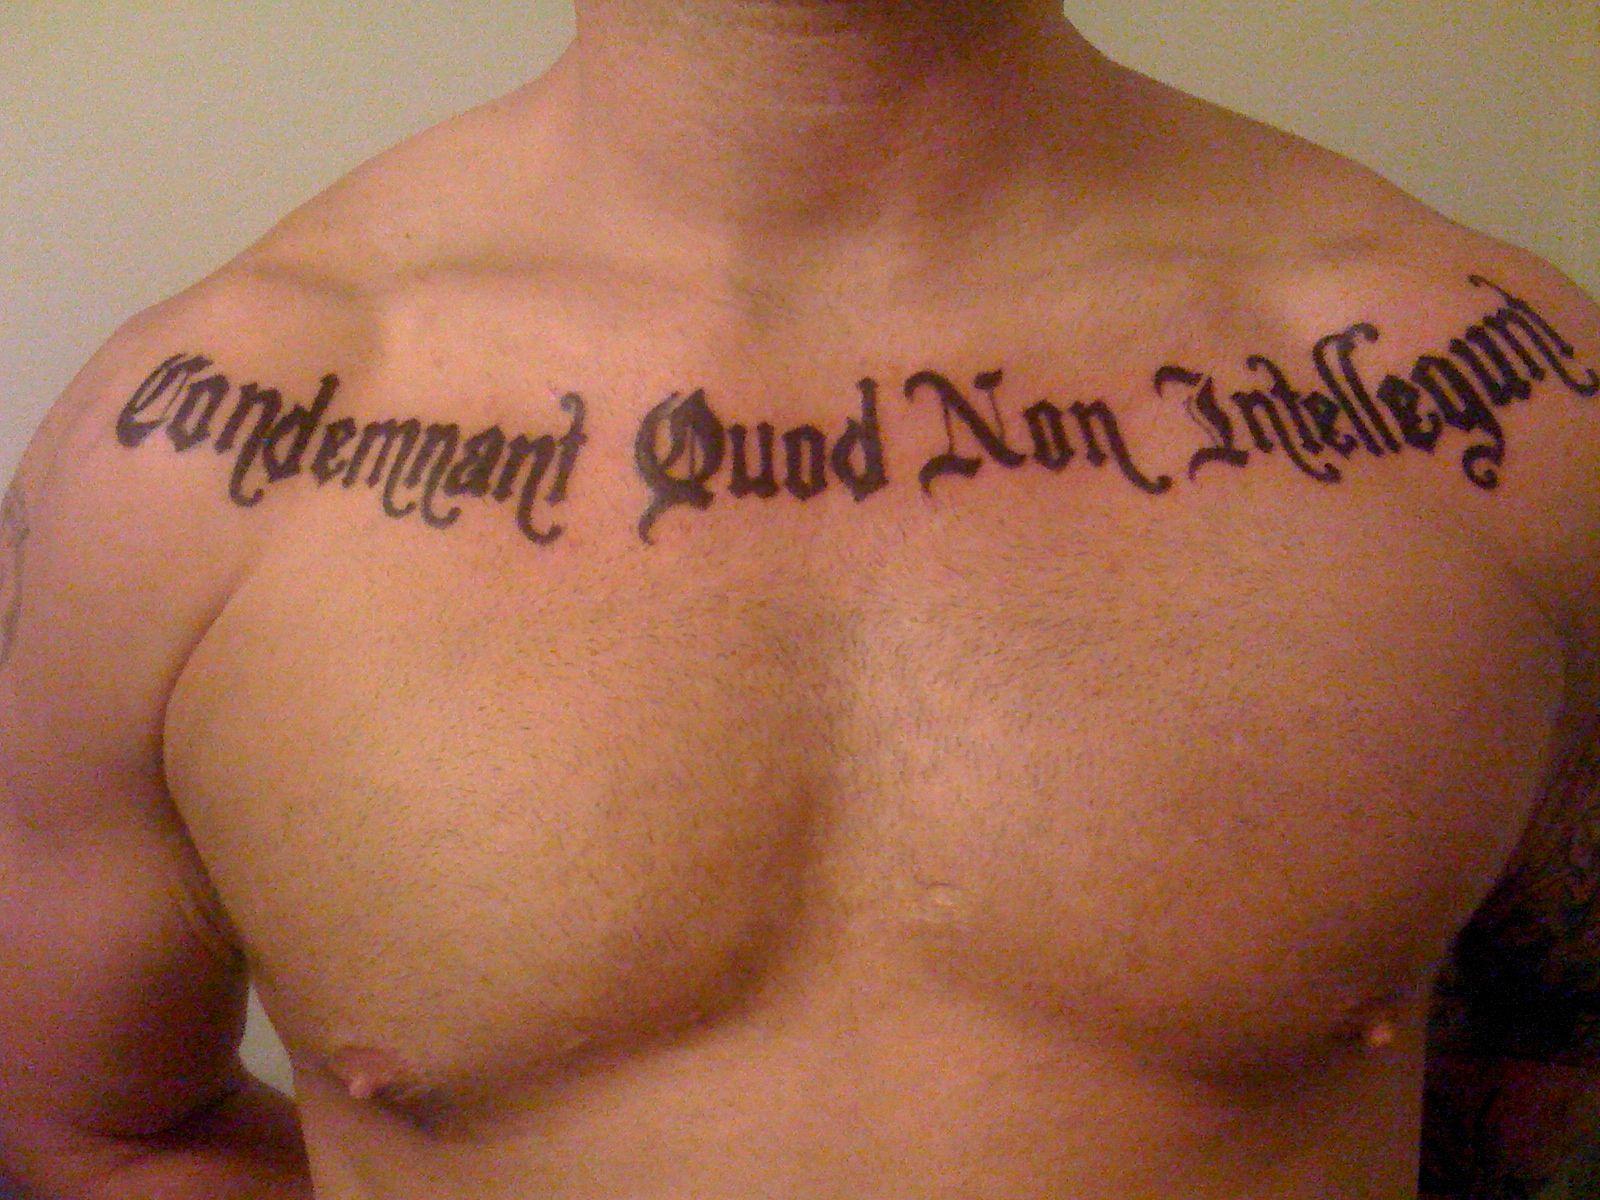 Pin 25 overwhelming rib tattoos for guys creativefan on pinterest - Inspirational Tattoo Design For Men Http Tattooideastrend Com Inspirational